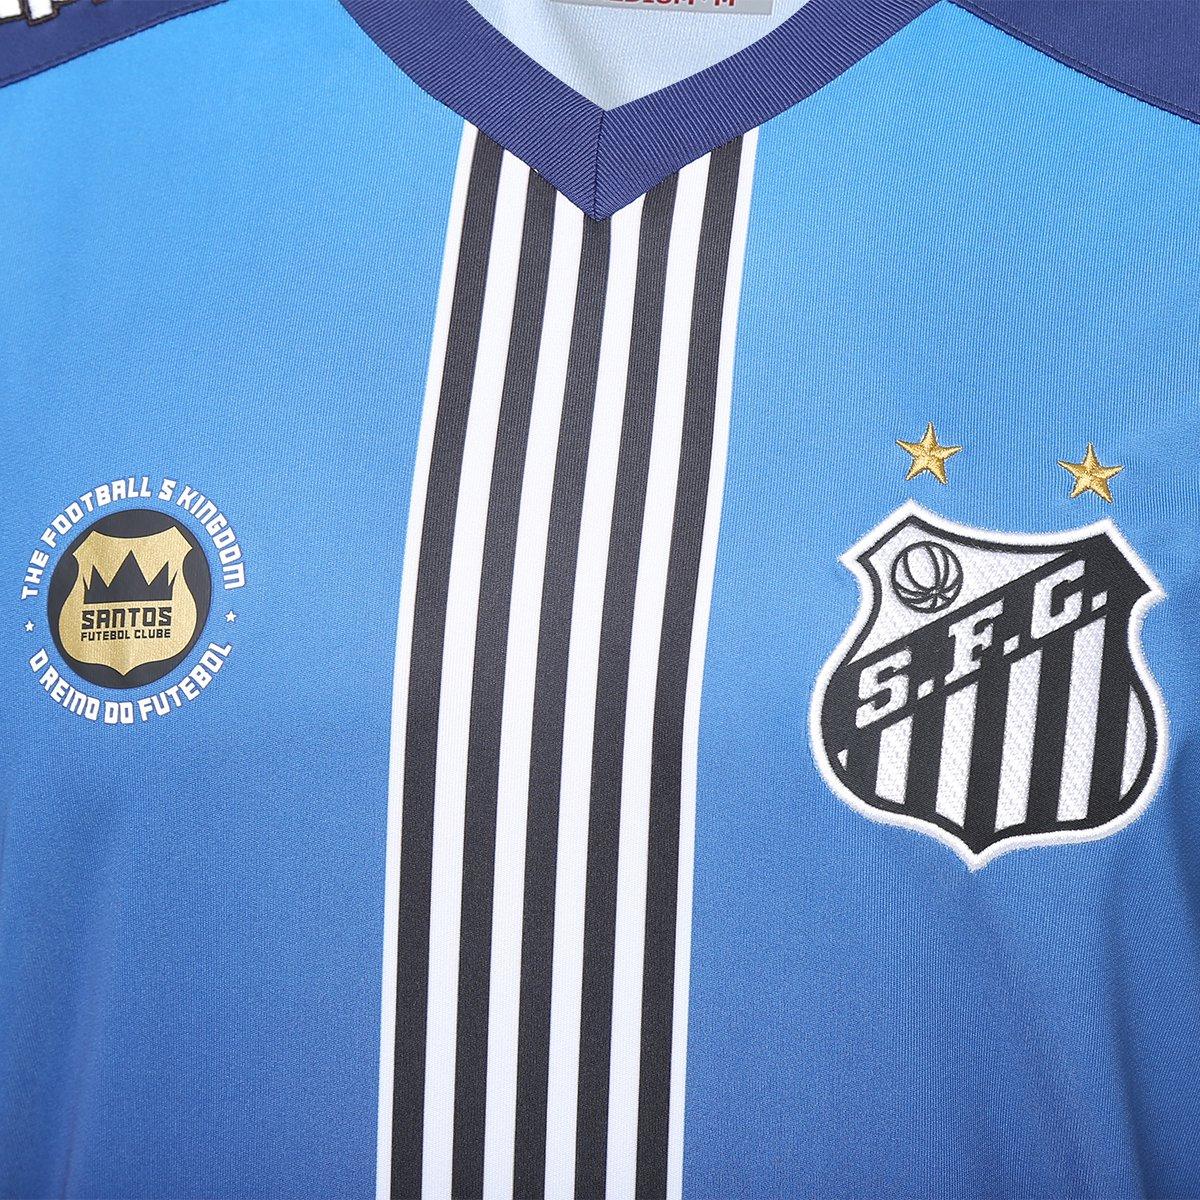 55ce2bde06c36 Camisa Santos III 2016 s nº Torcedor Kappa Masculina - Azul e Marinho